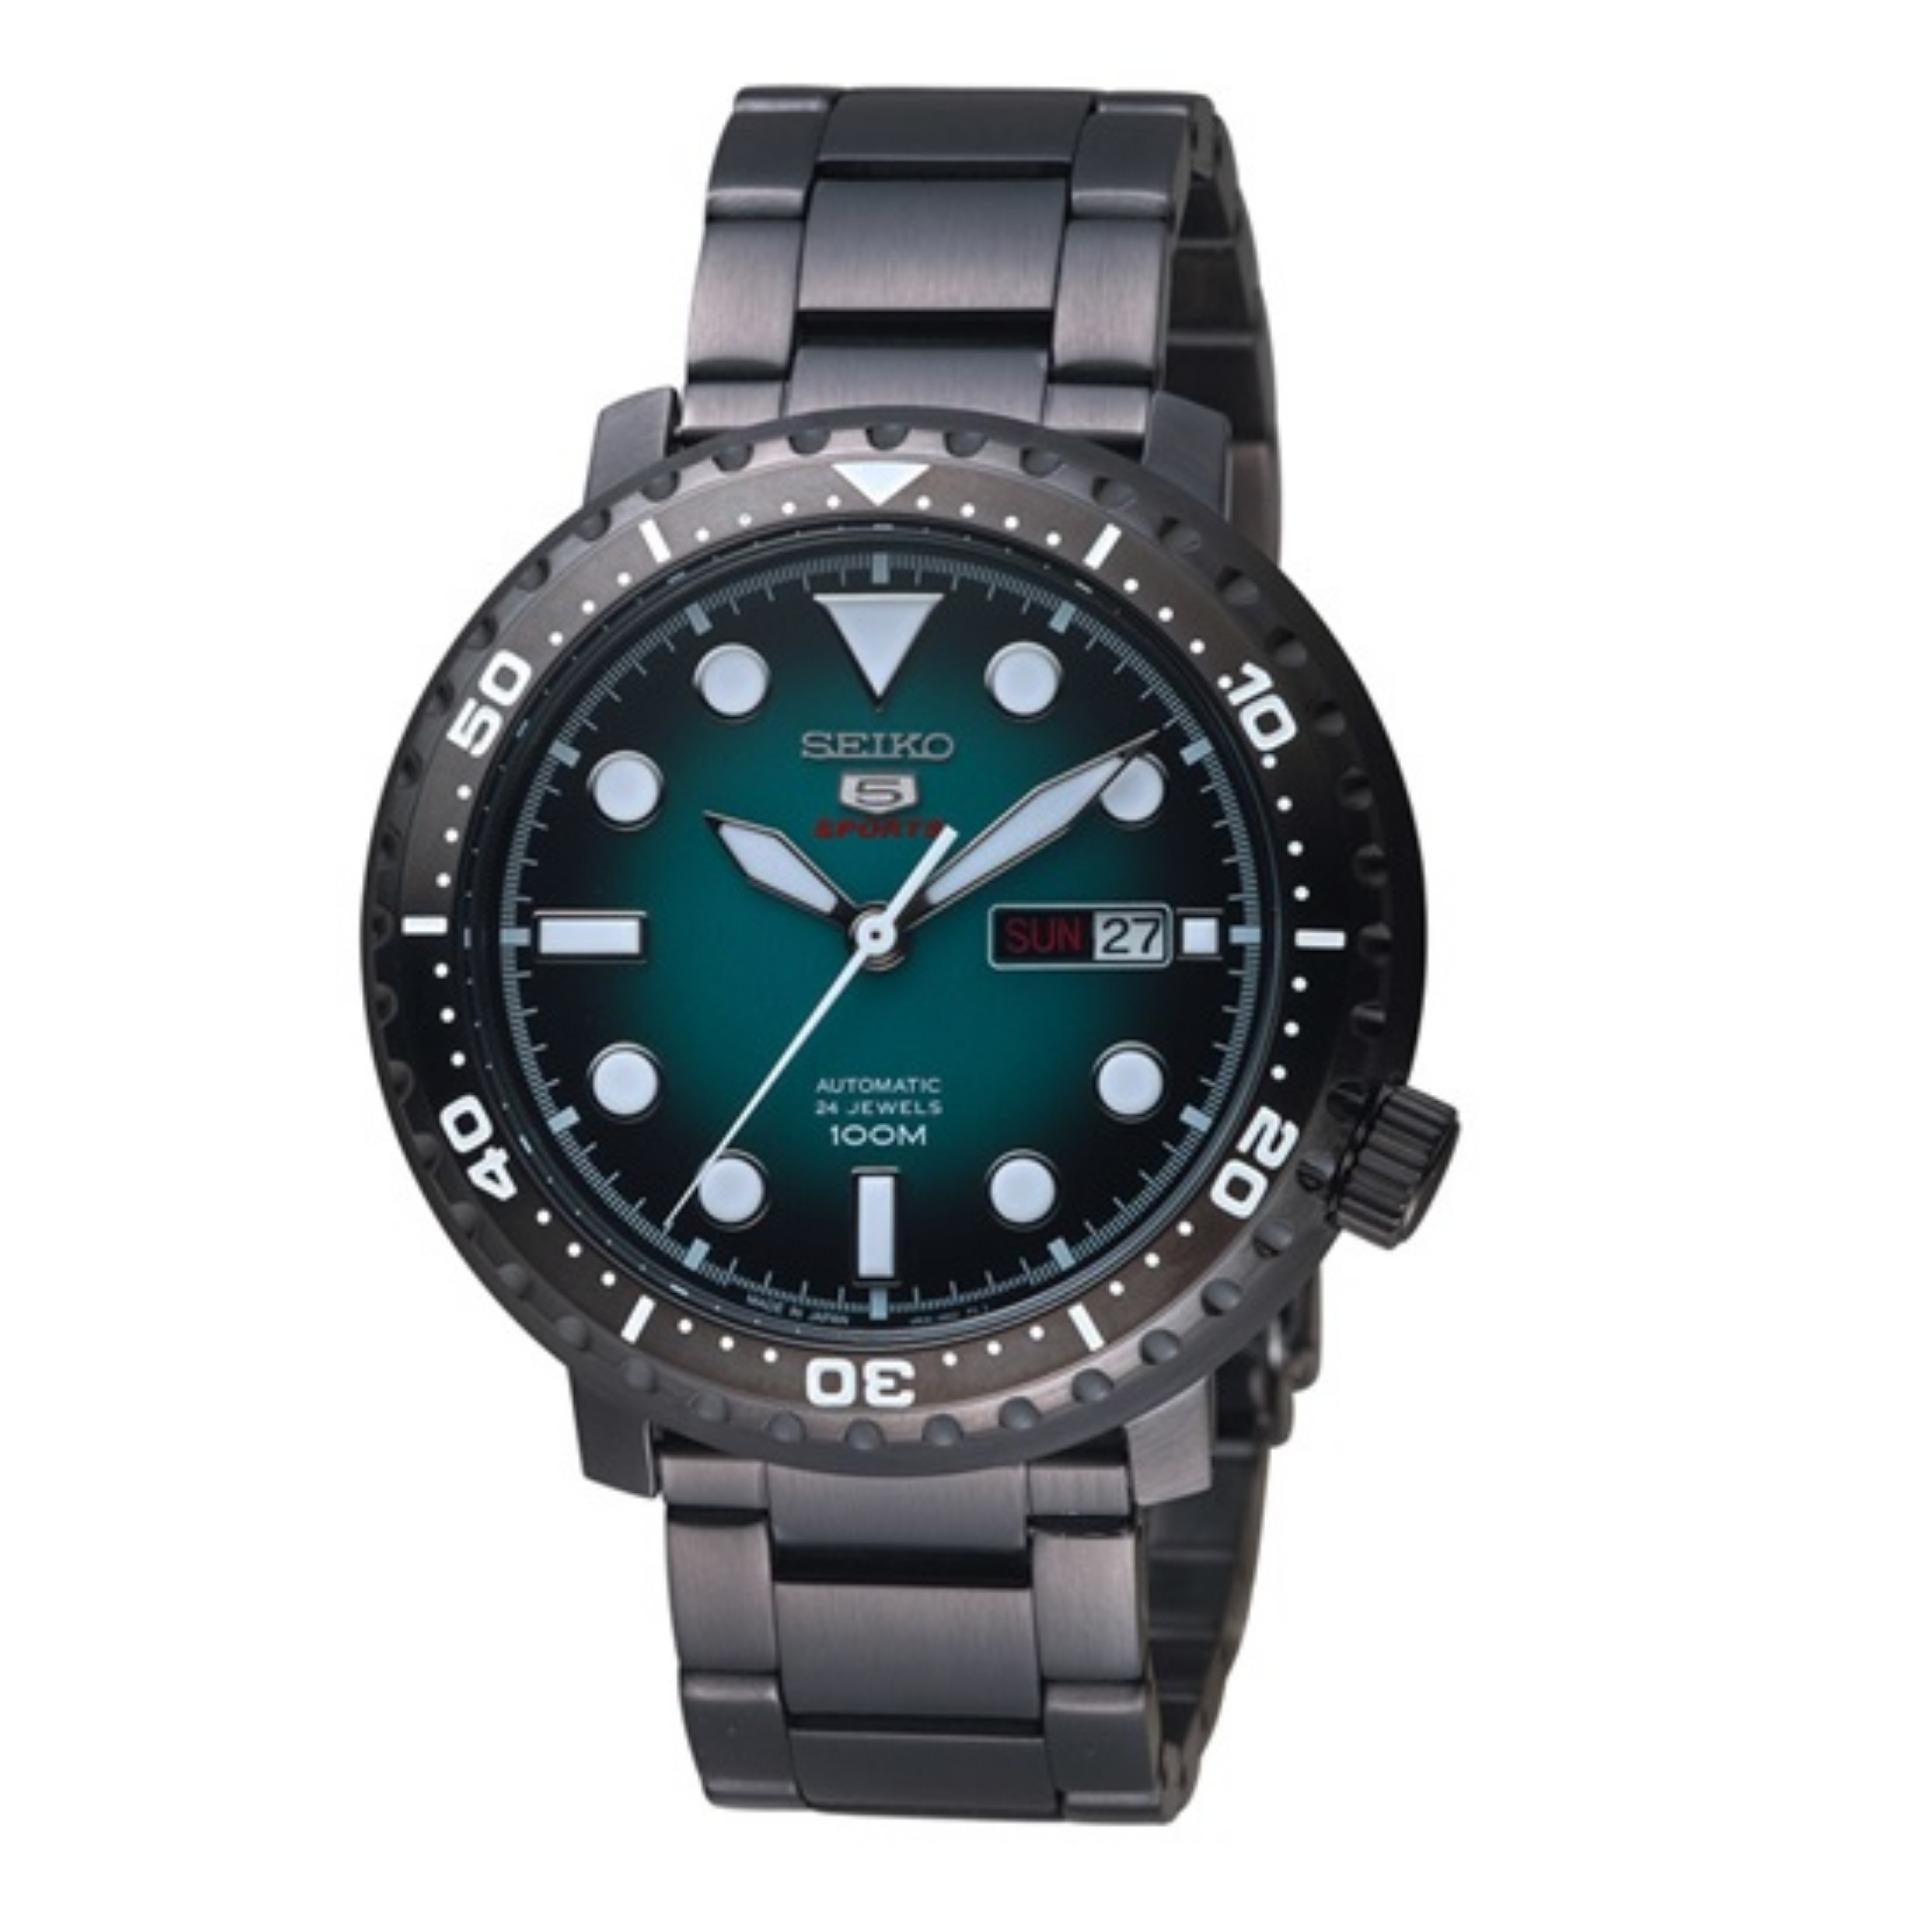 Srpc65j1 Seiko Men's 5 Sports Automatic Watch oeWQrxBEdC